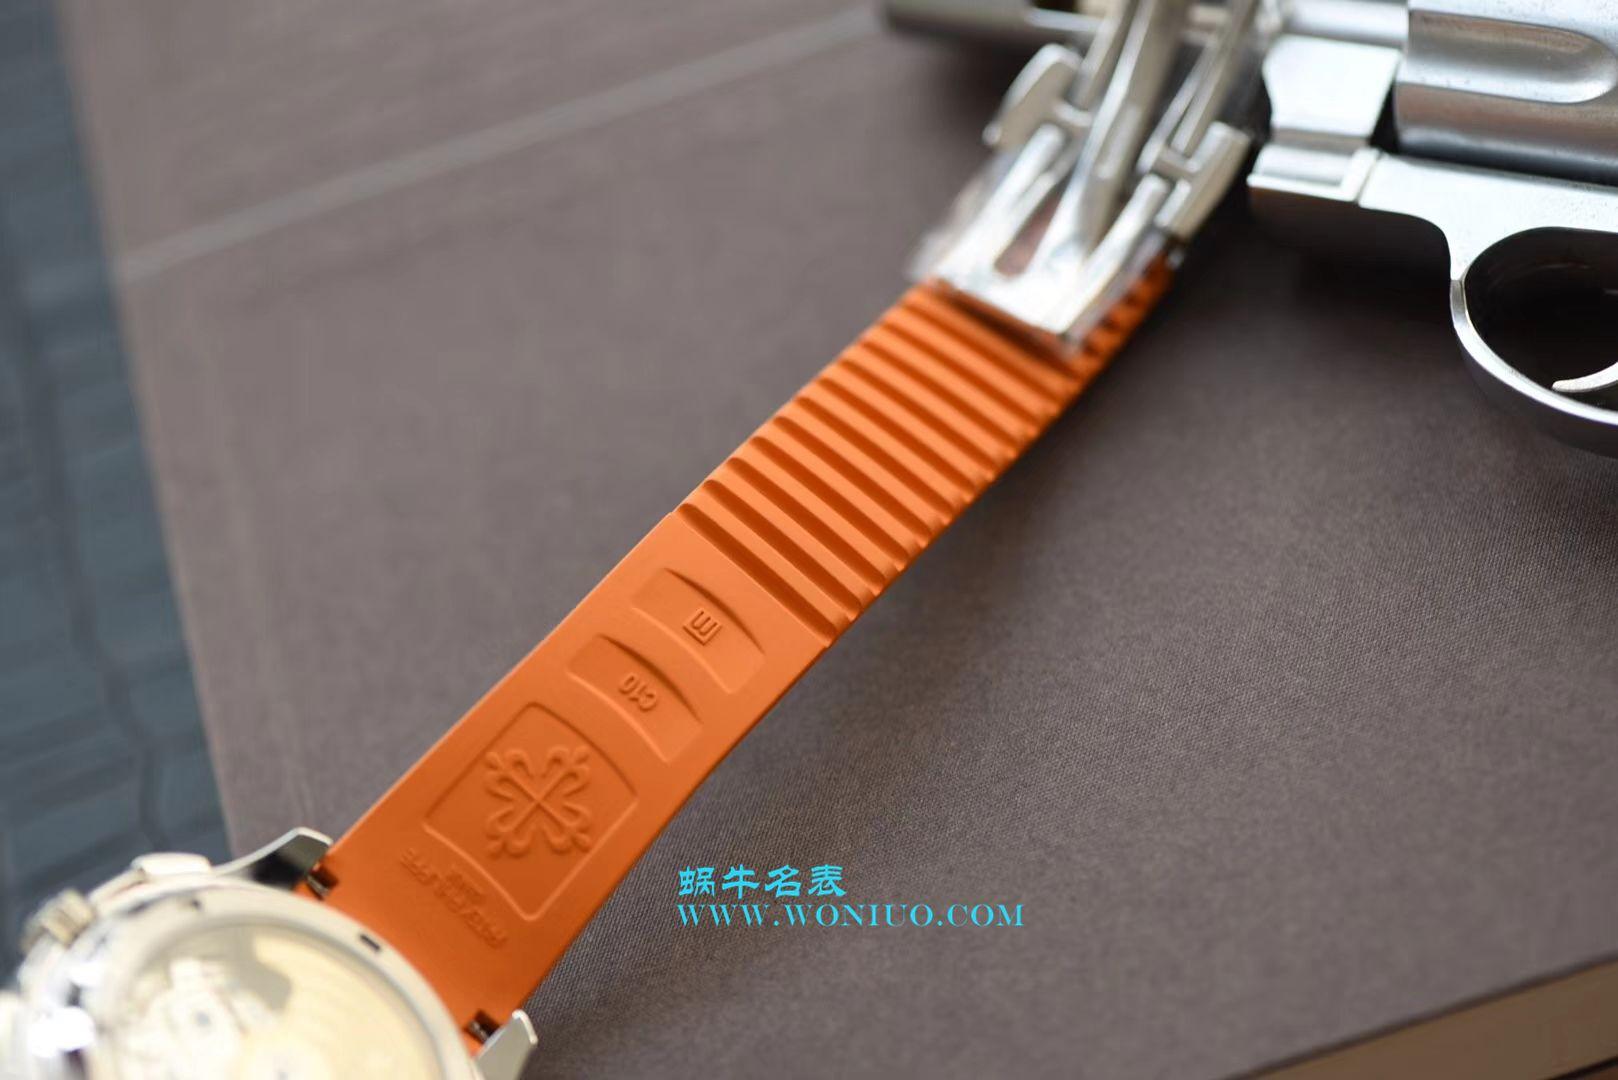 【YL厂顶级复刻手表】百达翡丽手雷AQUANAUT系列5968A-001腕表 / BD227